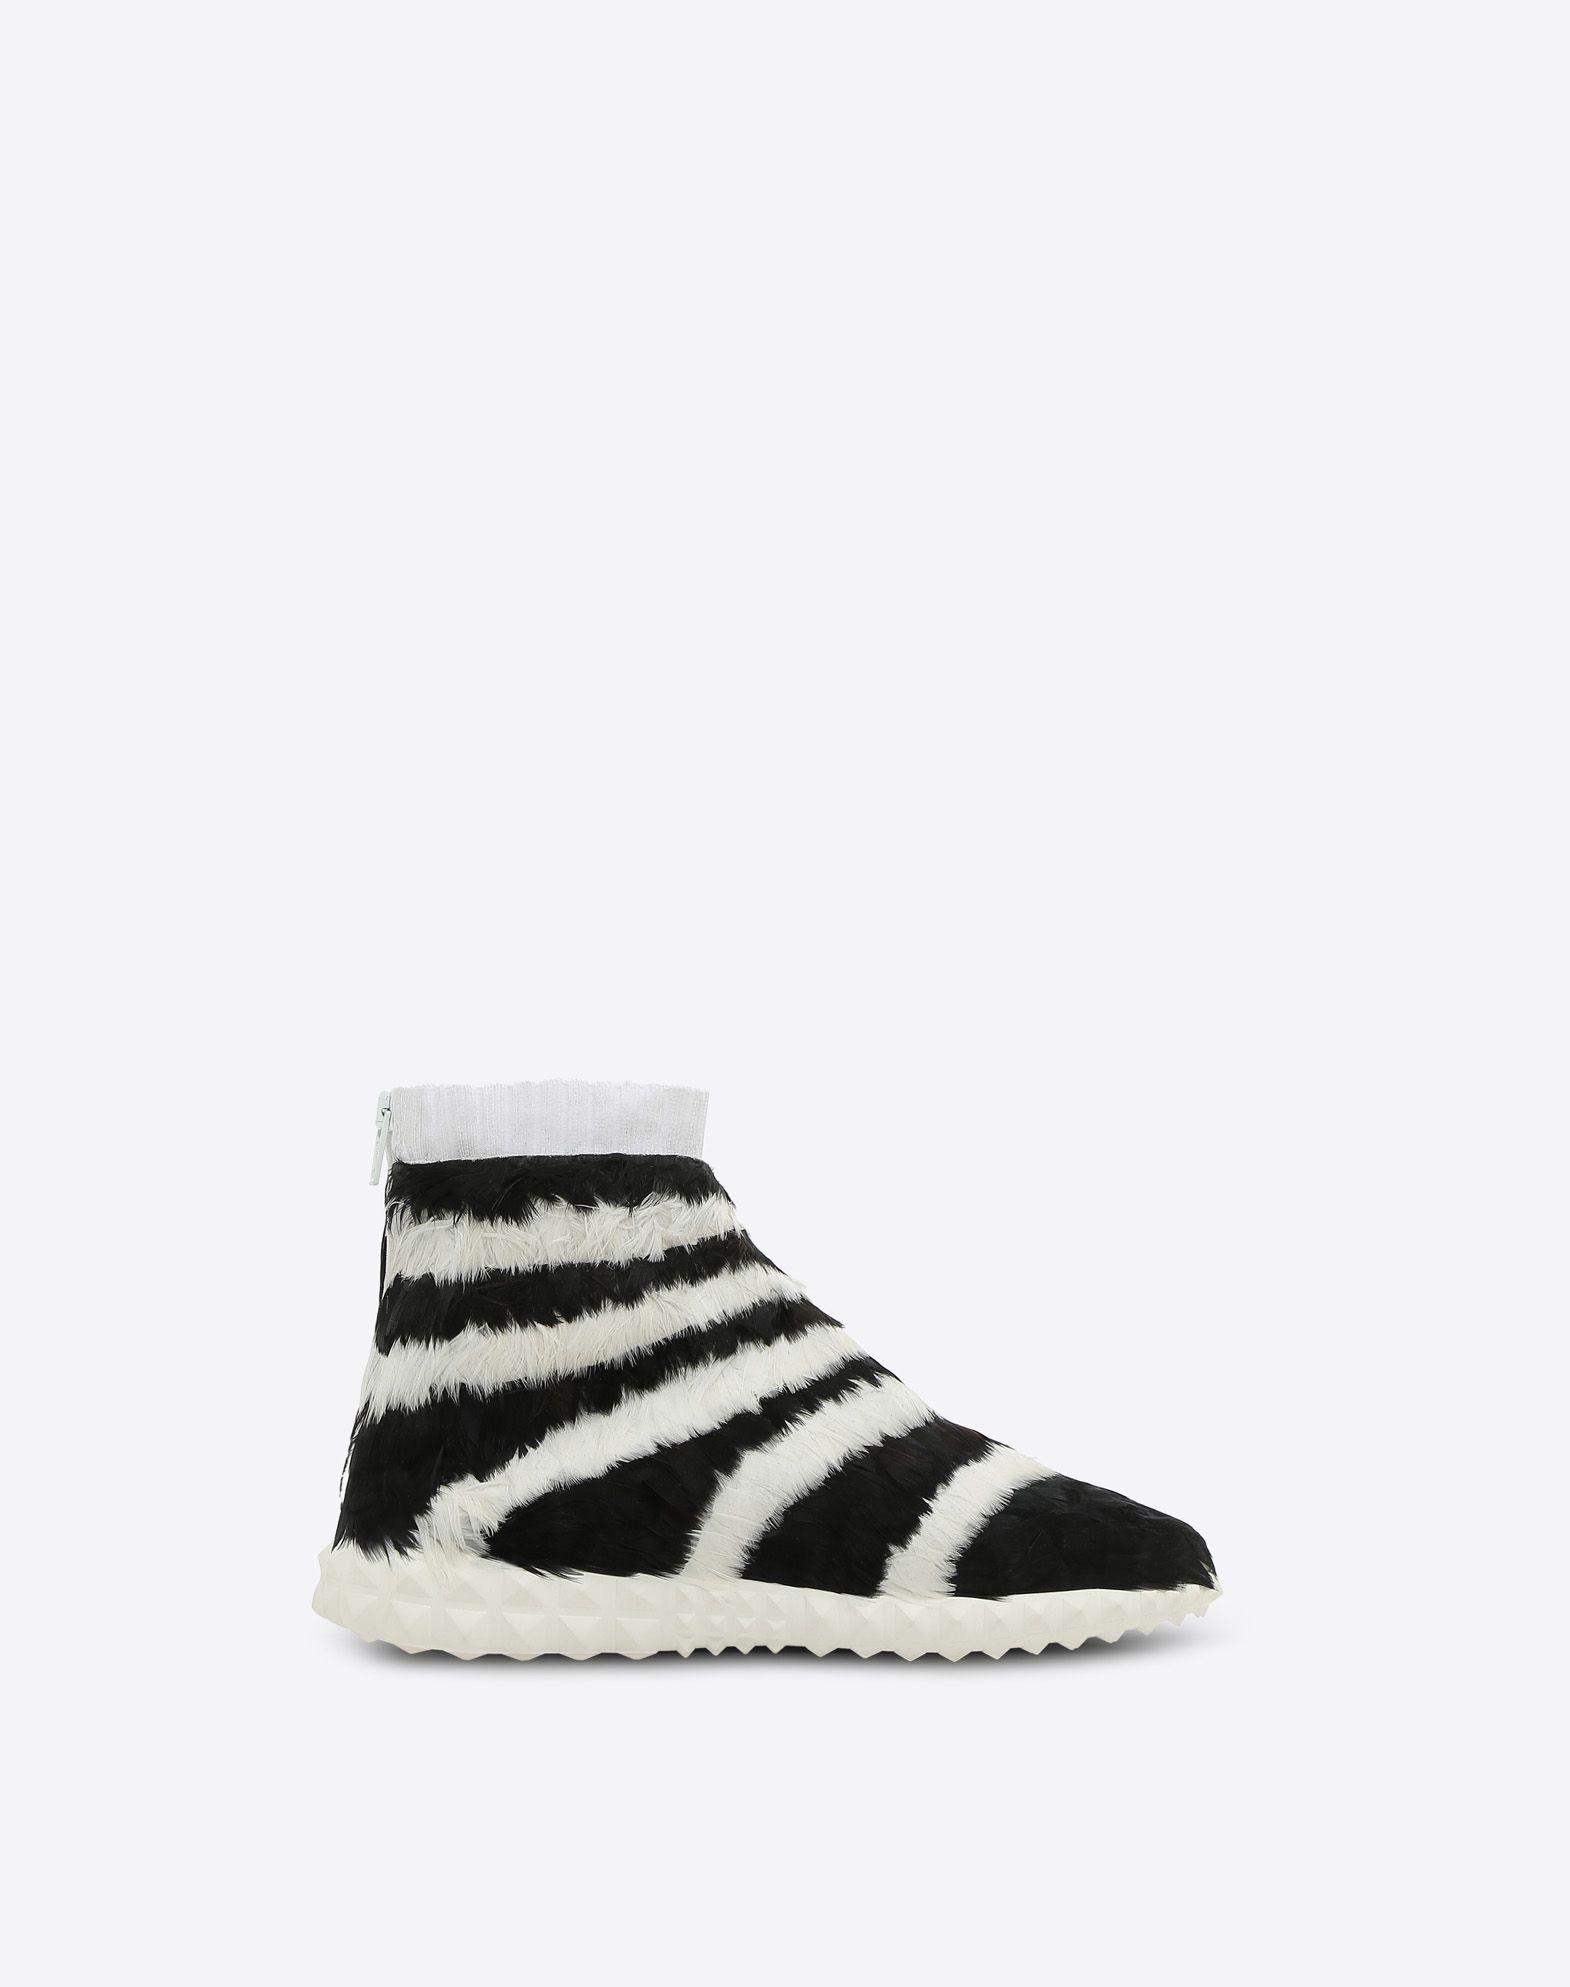 VALENTINO GARAVANI Sneakers con plumas SNEAKERS ALTAS D f